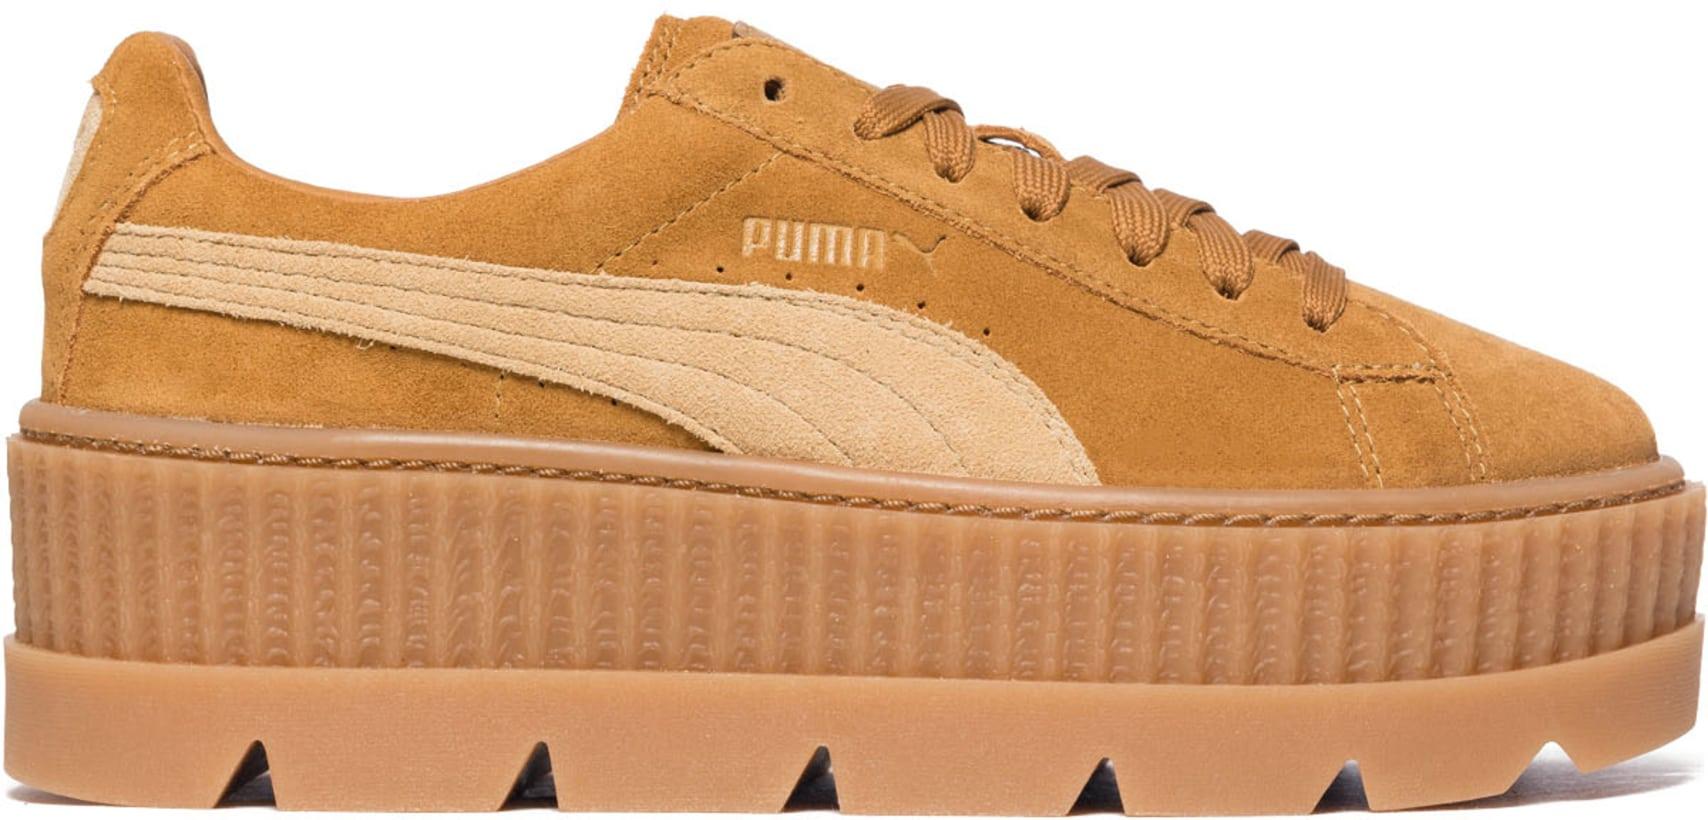 release date: 8cdc2 a5670 Puma - Fenty Cleated Creeper - Brown Lark